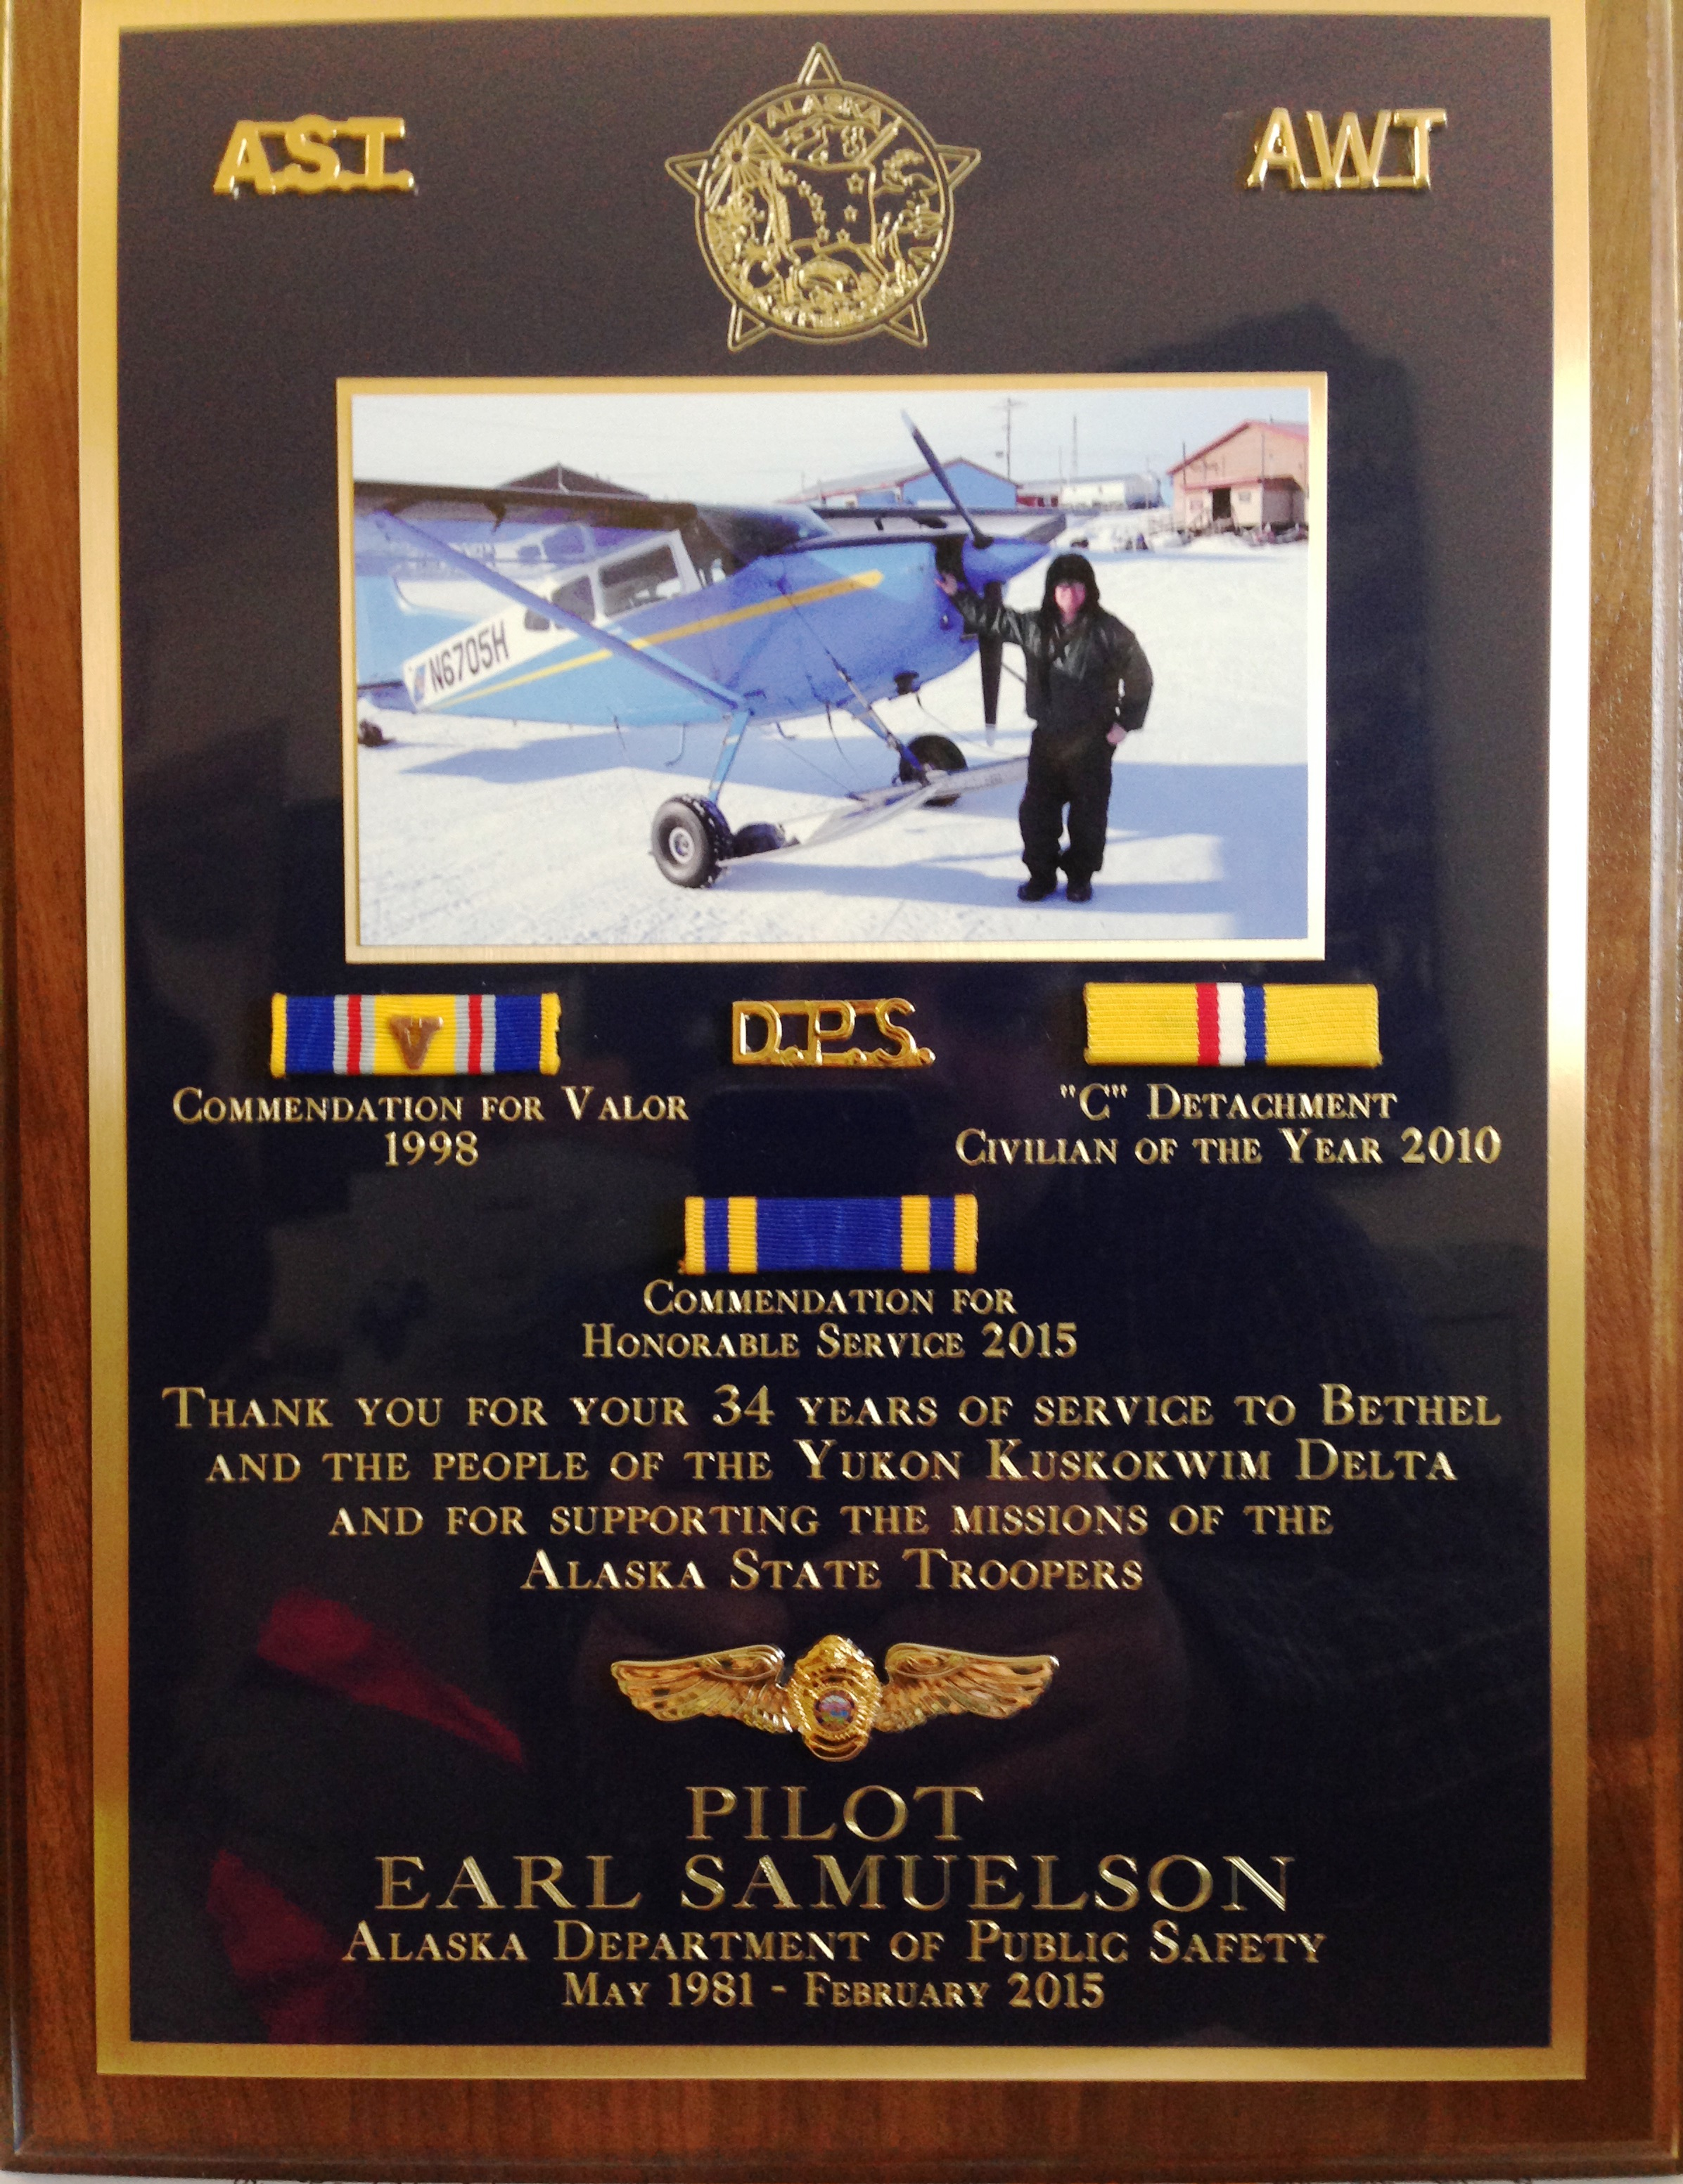 3-7 The Legendary AST Pilot Earl Samuelson, Sr  Honored at